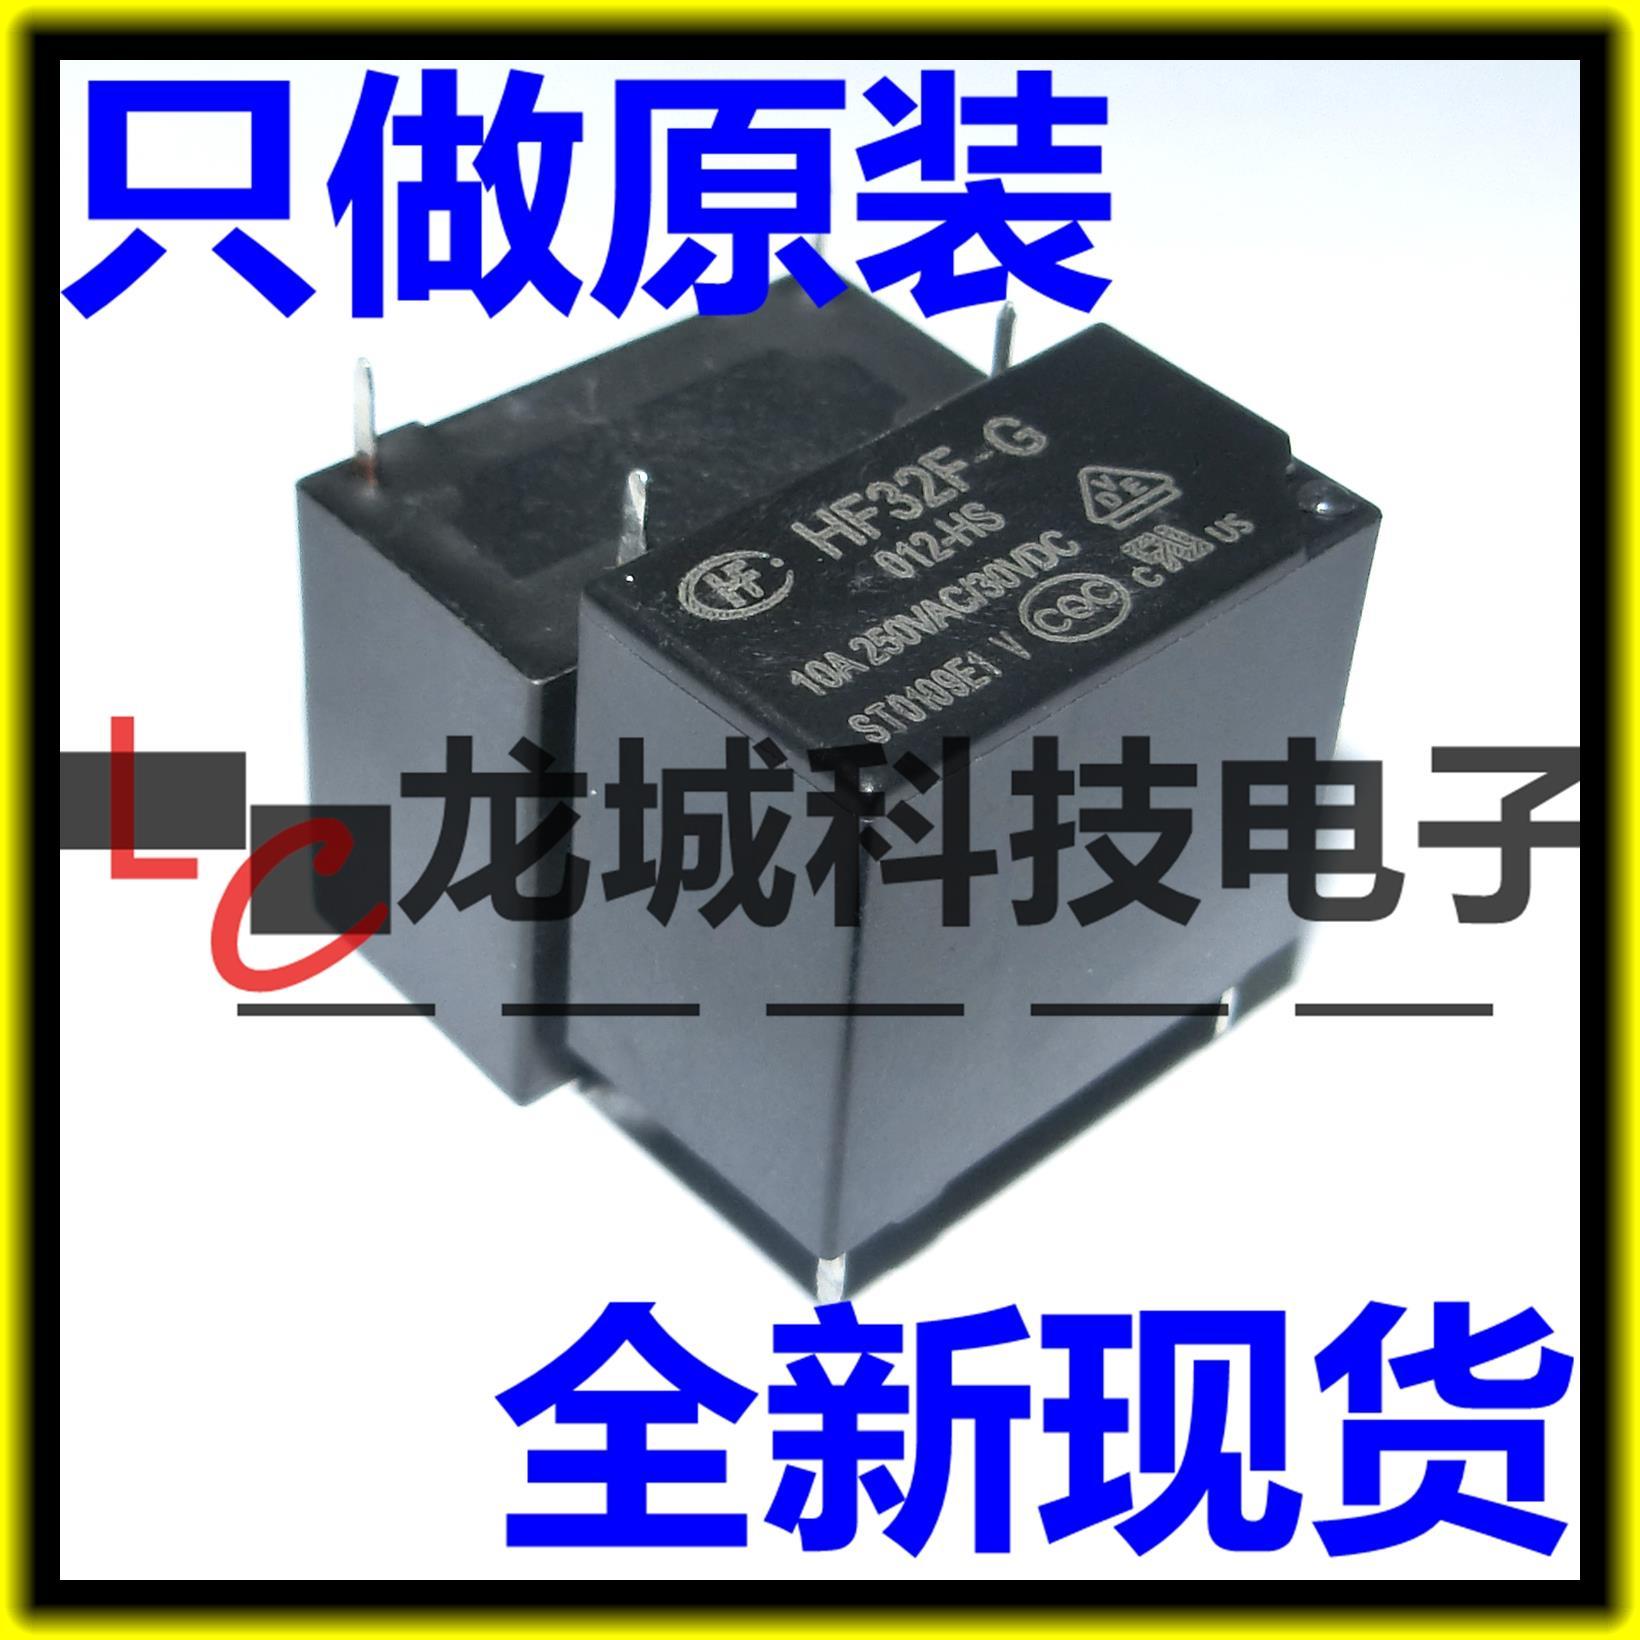 HF32F-G-012-HS 005 012 024 JZC-32F-G-012-HS